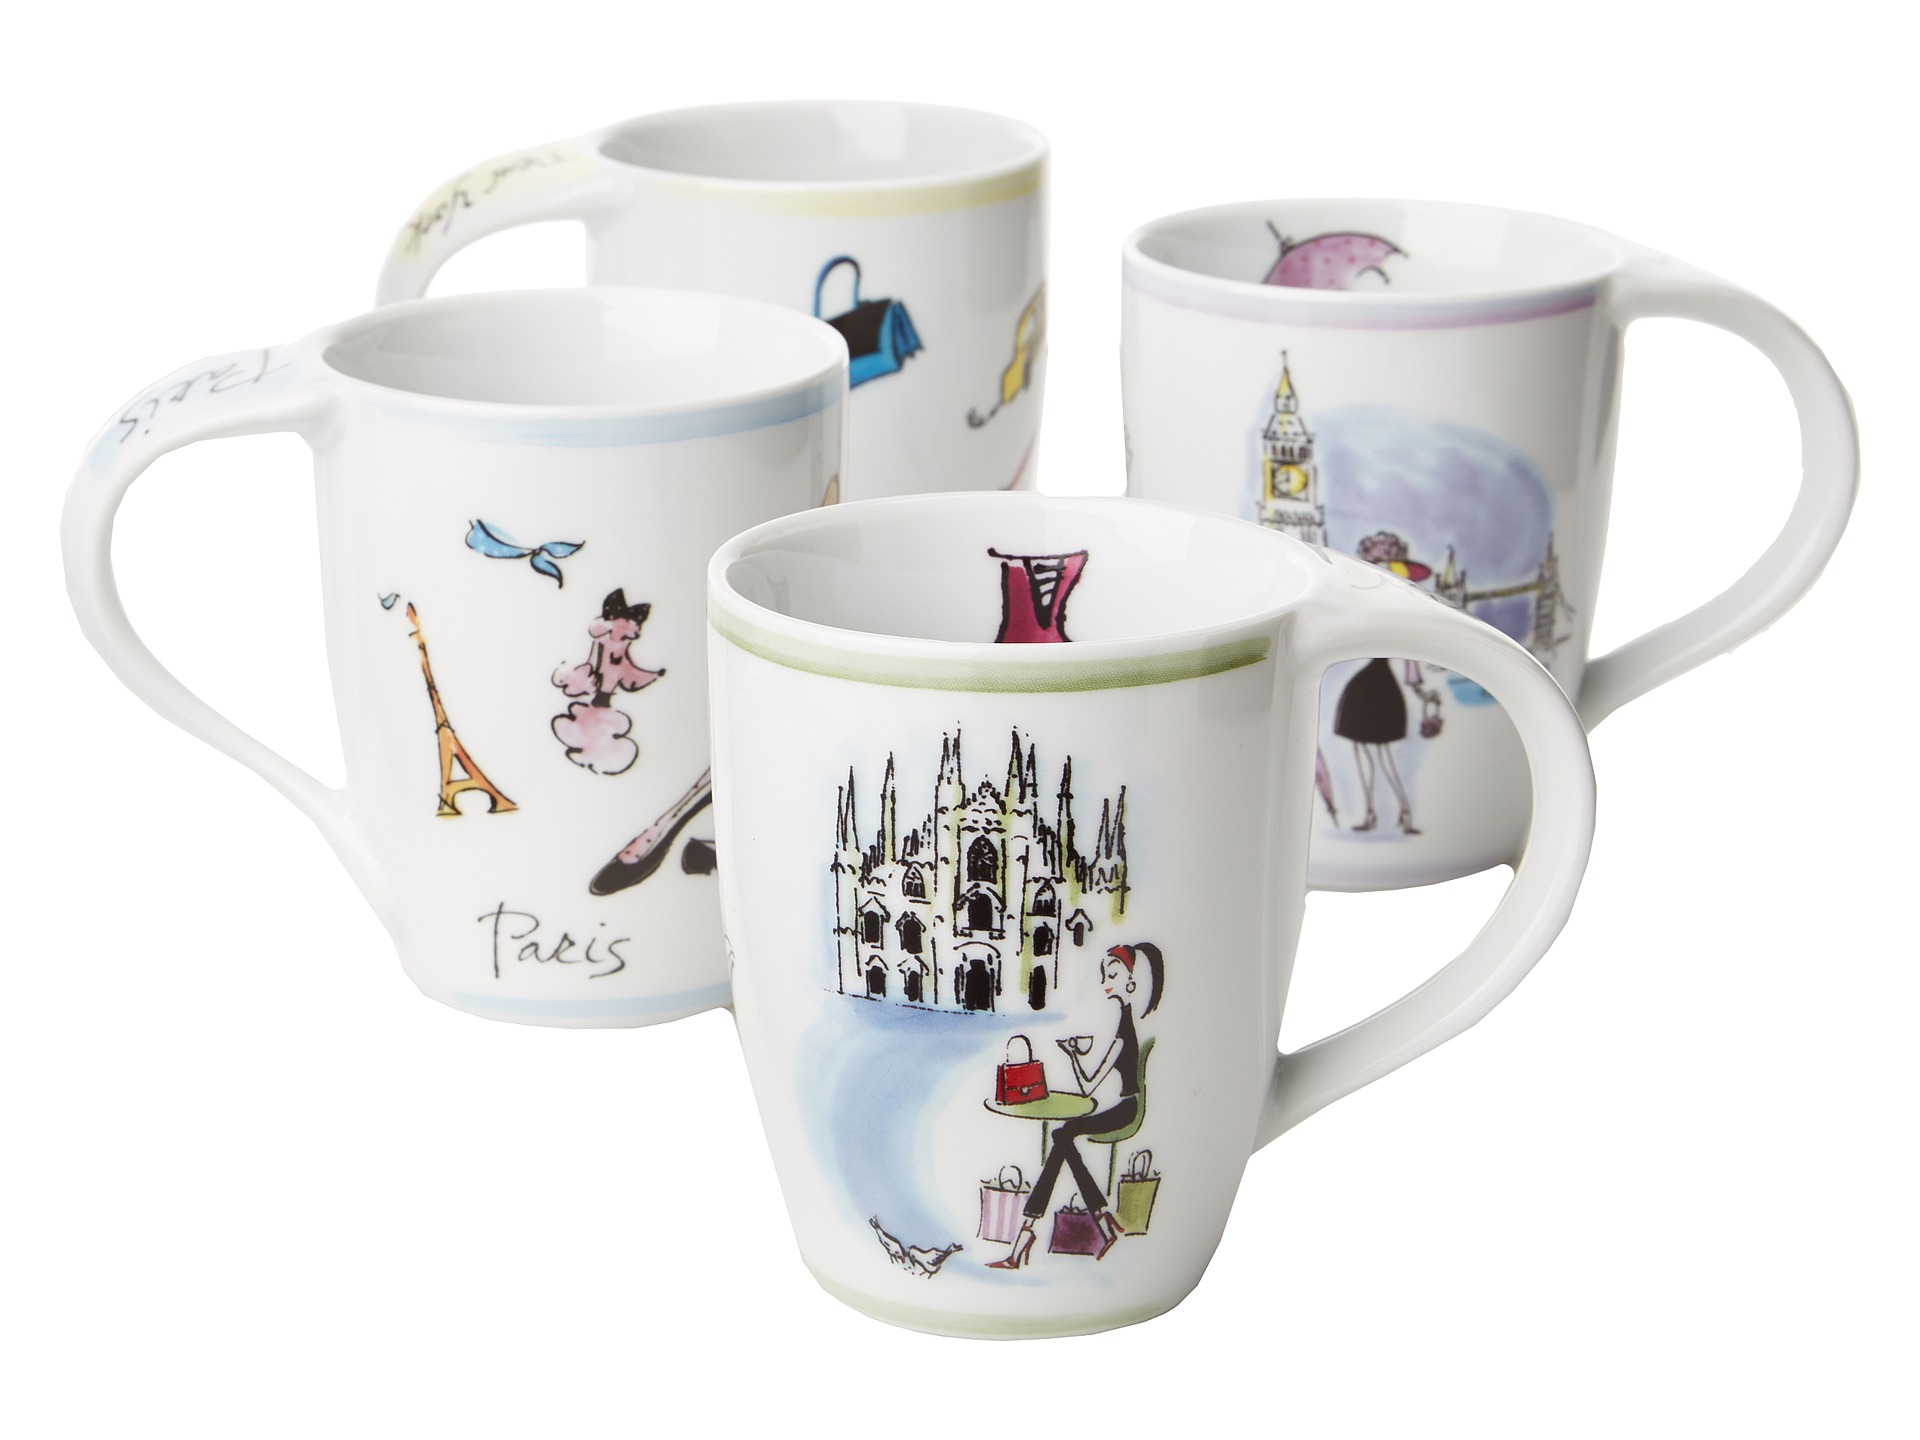 Waechtersbach Fashion Collection Mugs Set Of 4 Shipped